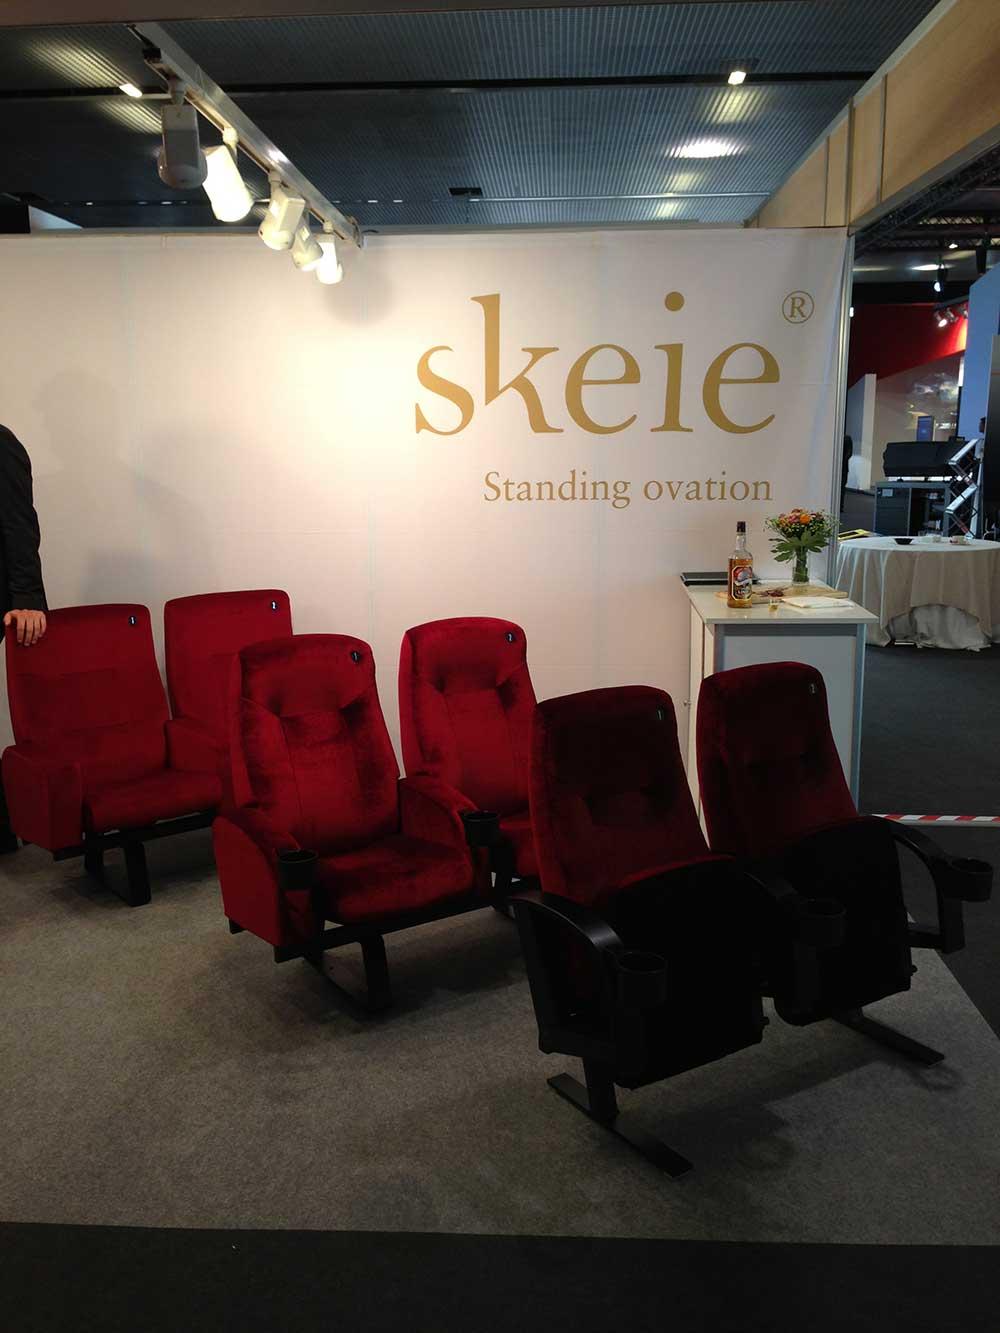 Skeie-stoler på utstilling i CineEurope 2013. Foto: Sigurd Moe Hetland.